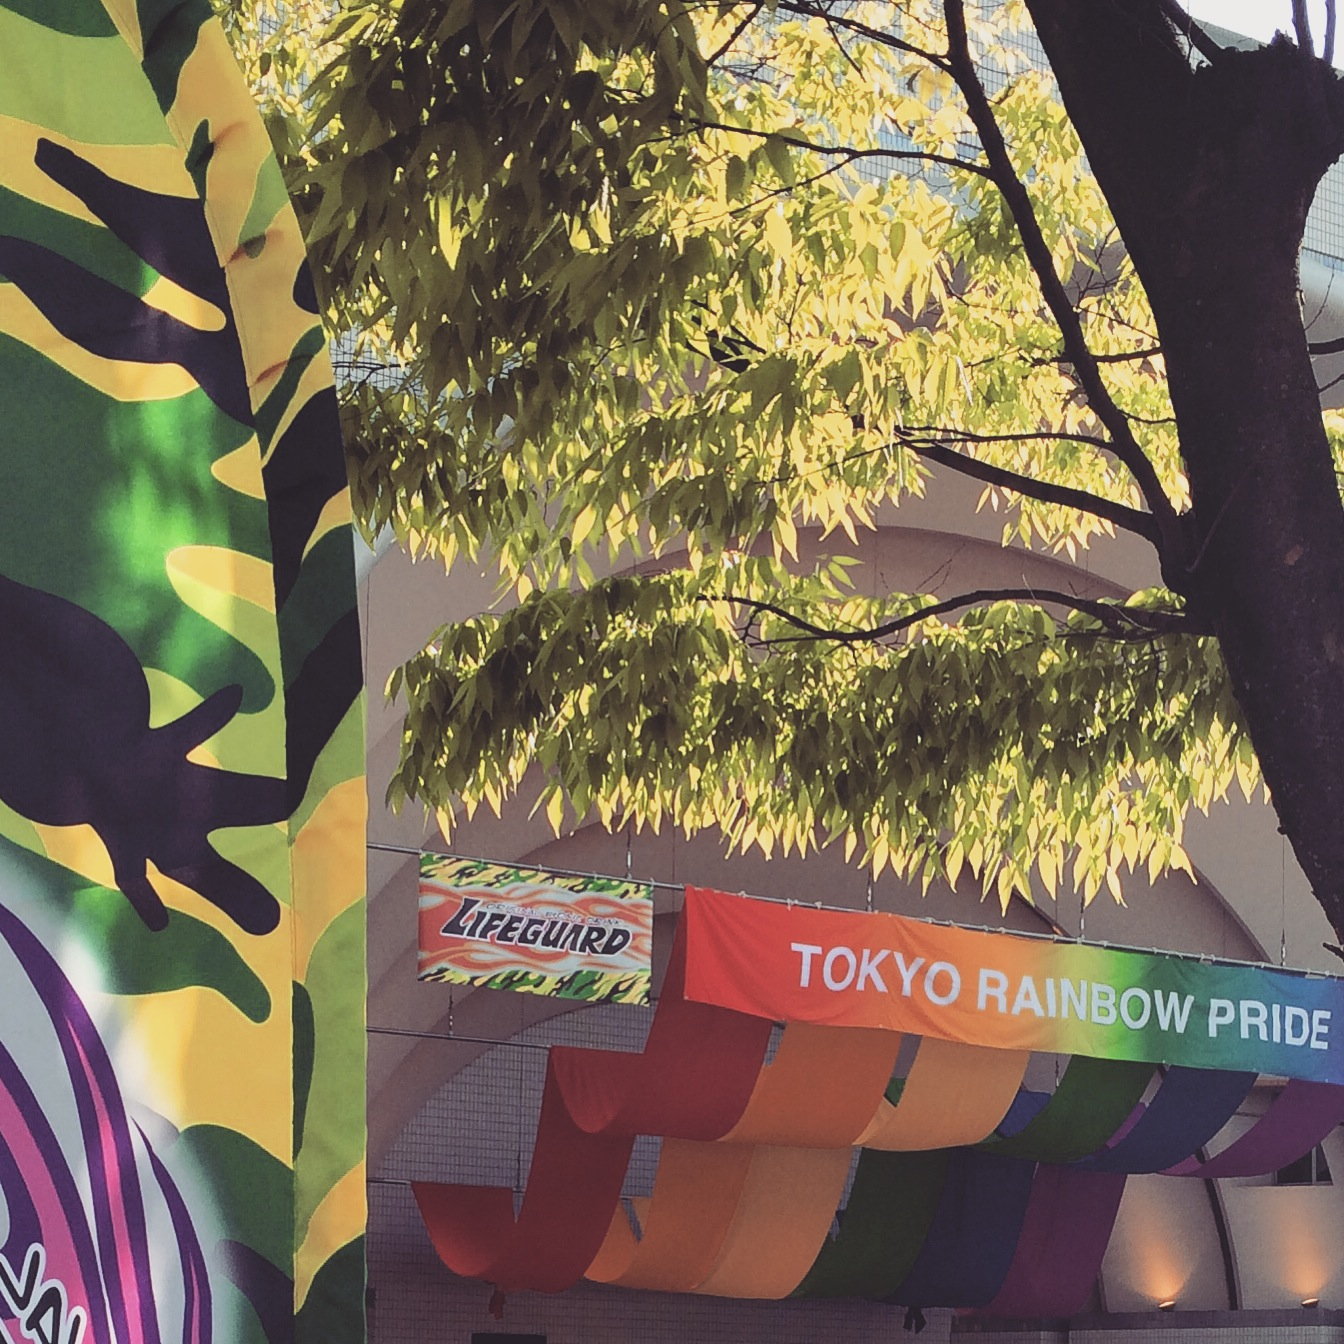 LGBTイベント「東京レインボープライド」4月27日より代々木公園などで開催